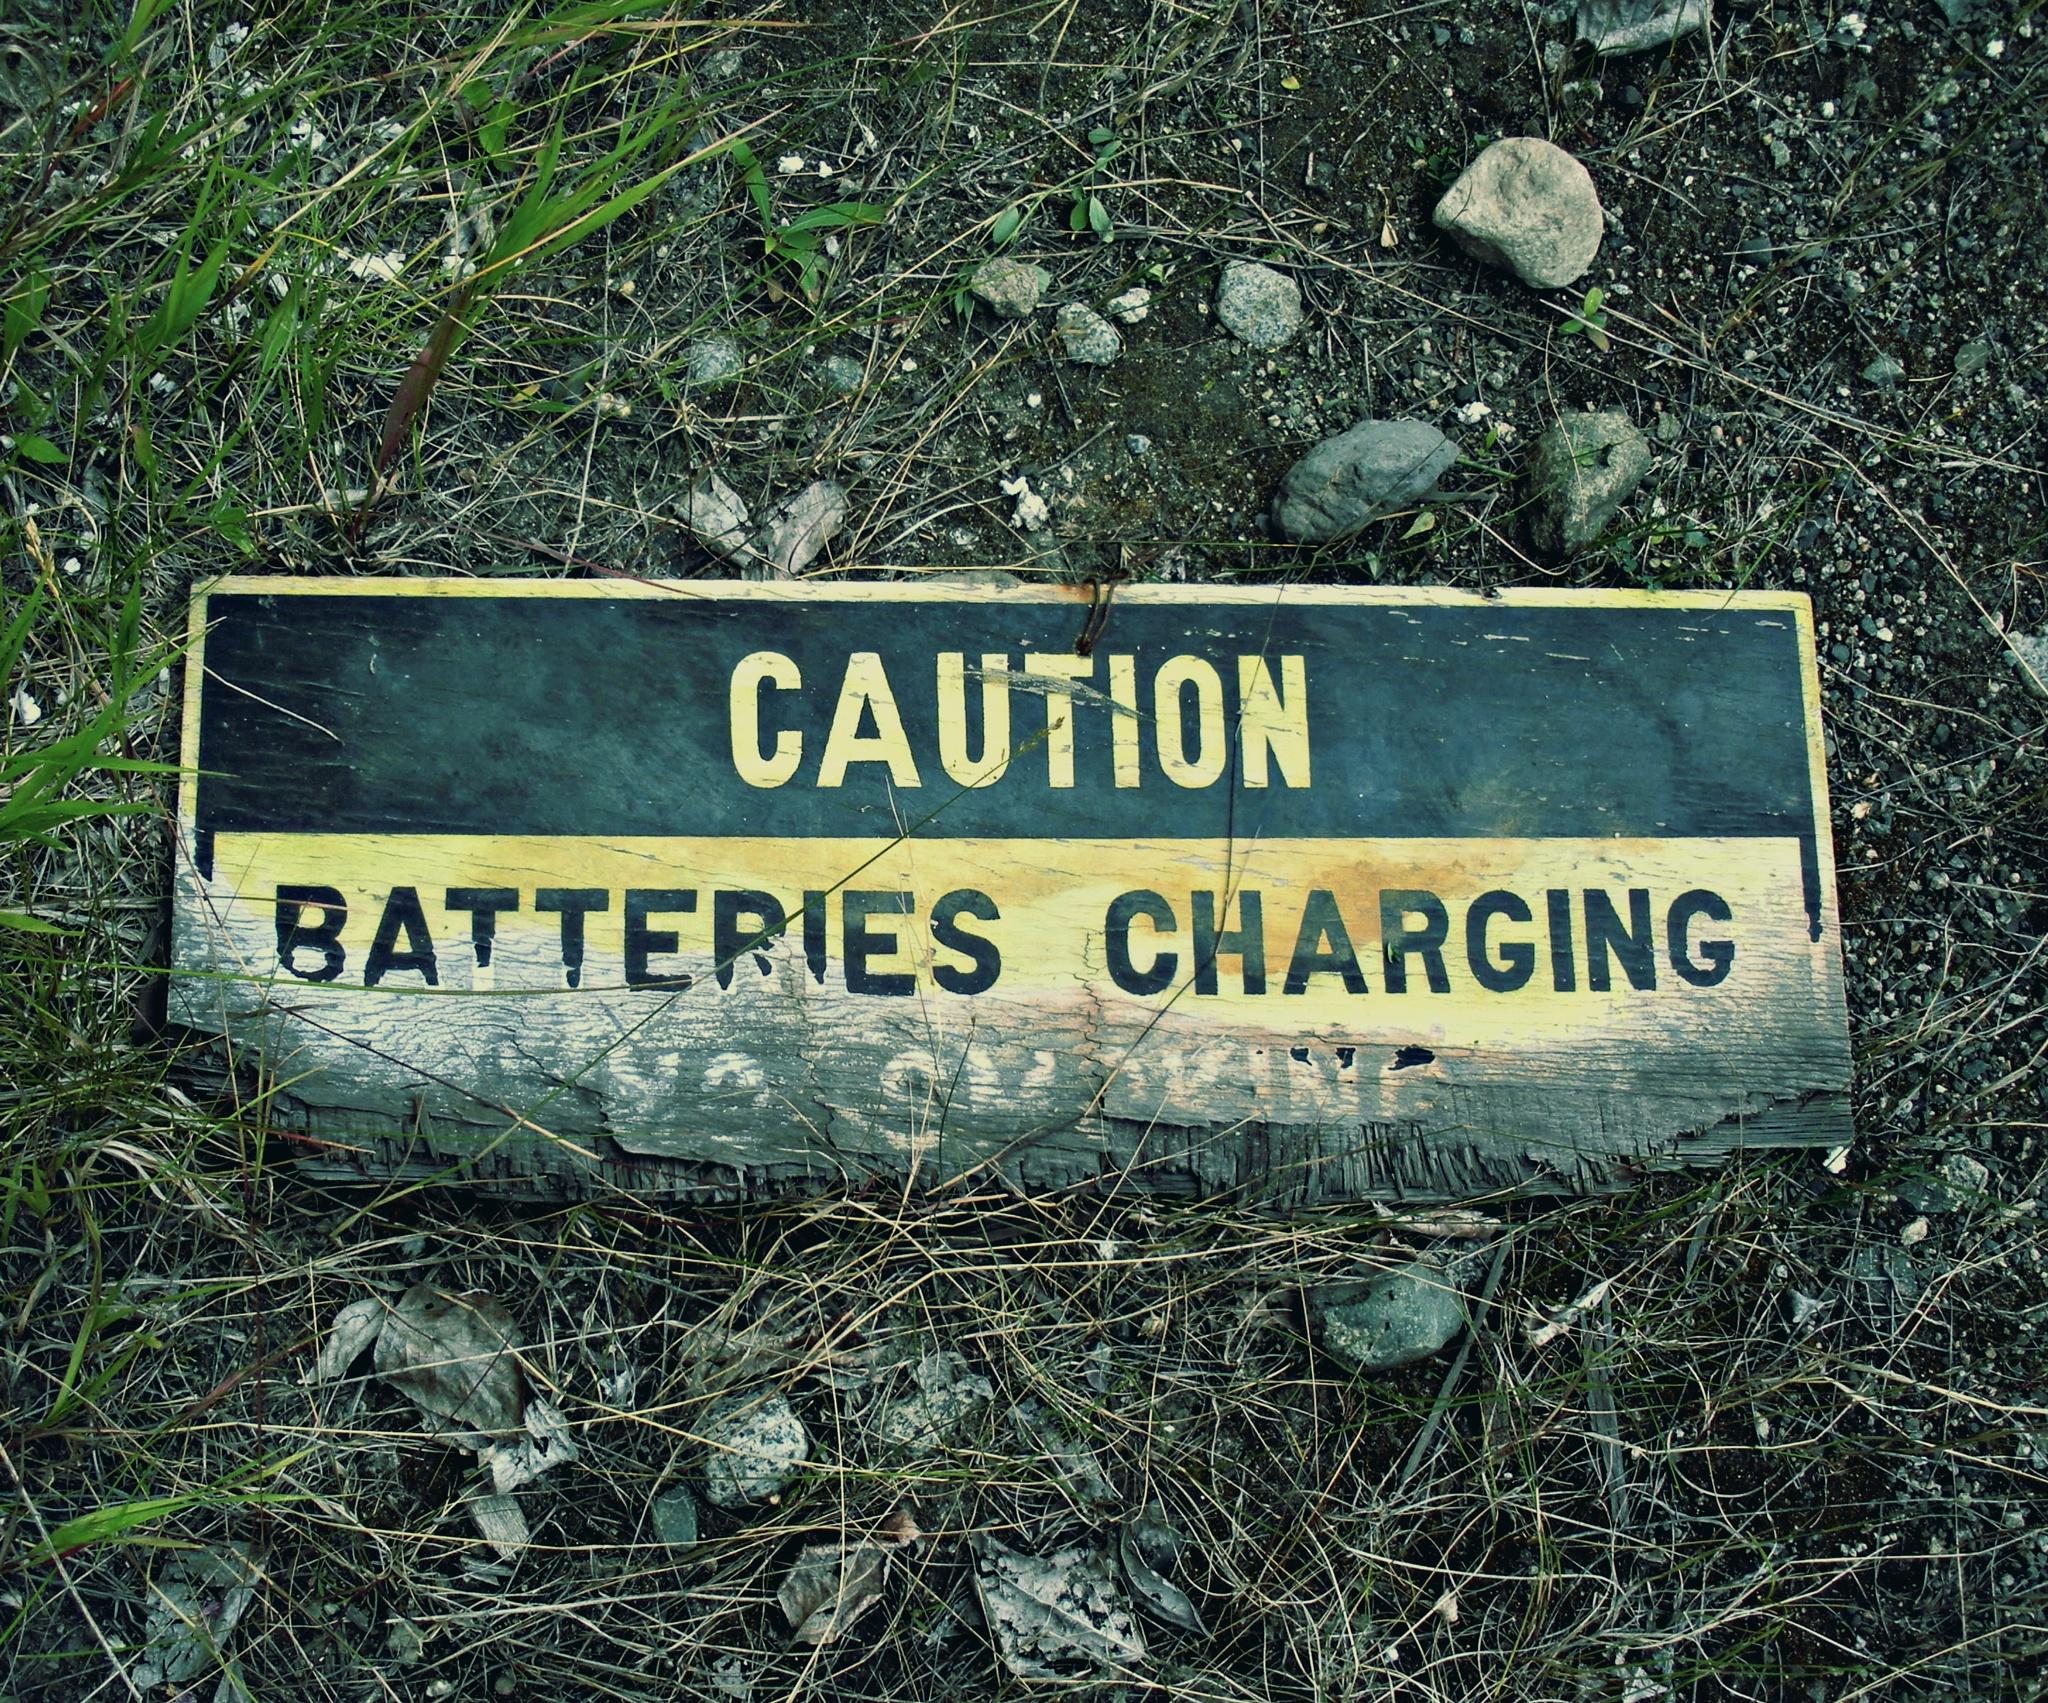 Charging by Scott Leroy